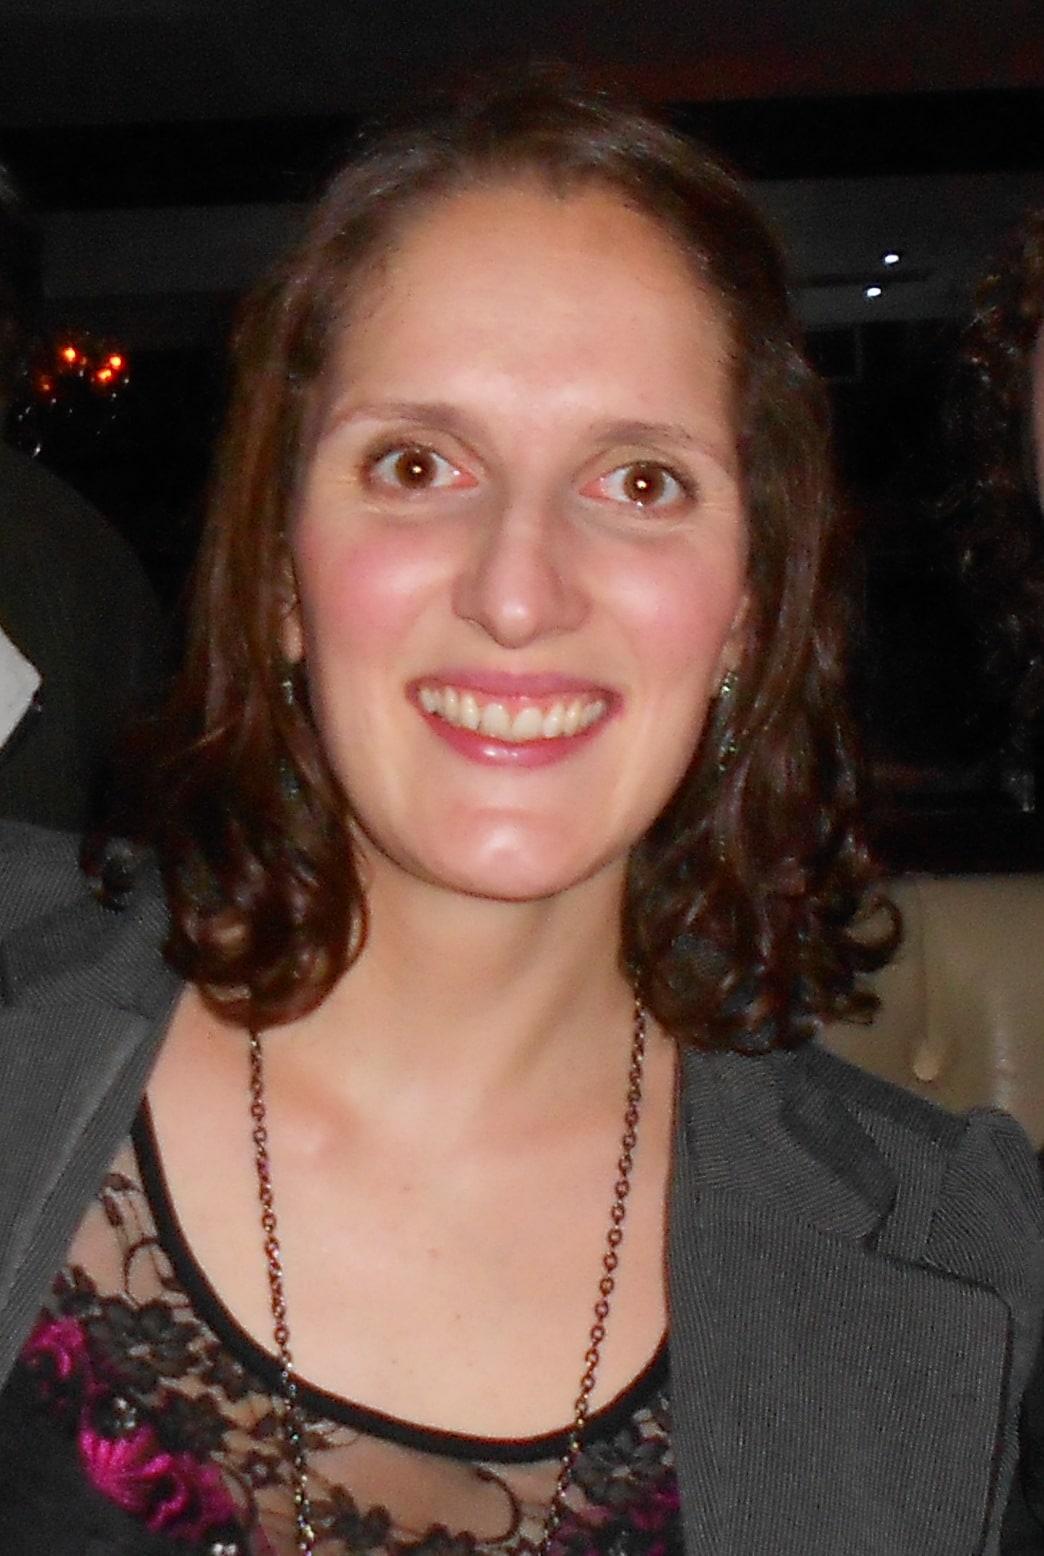 Caroline from Rosslare Strand